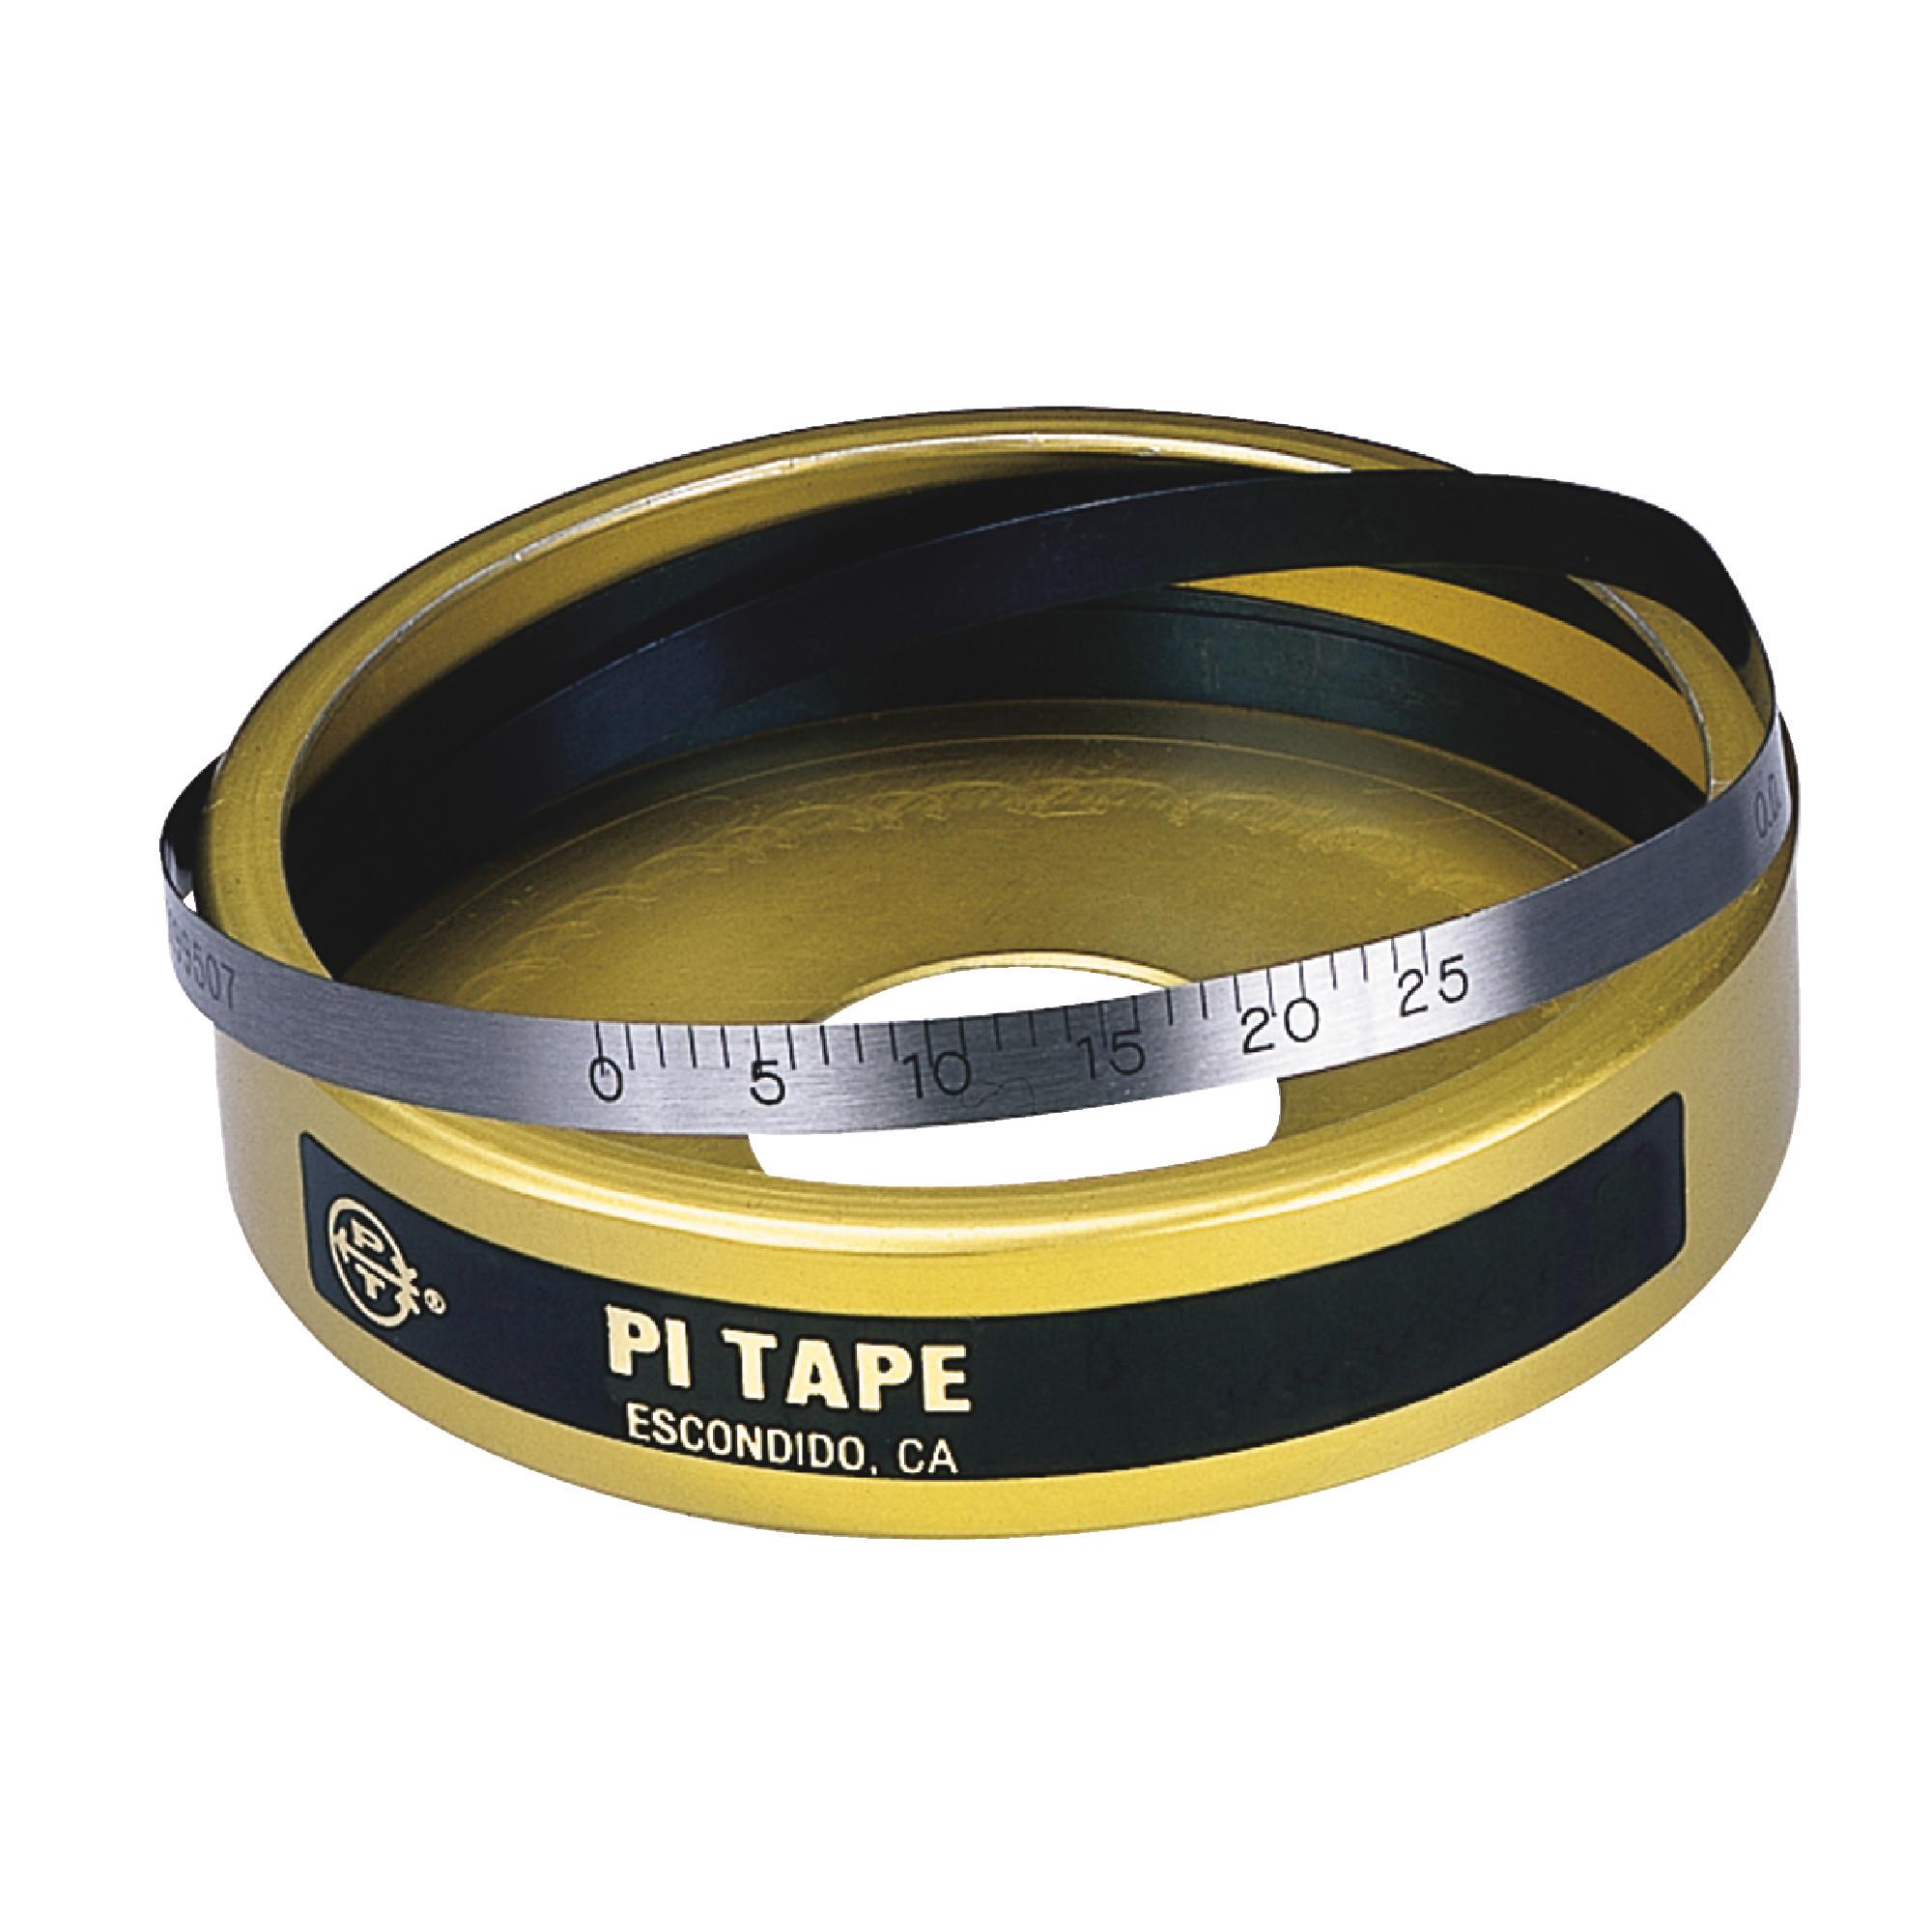 PI TAPE® Periphery Tape Measure